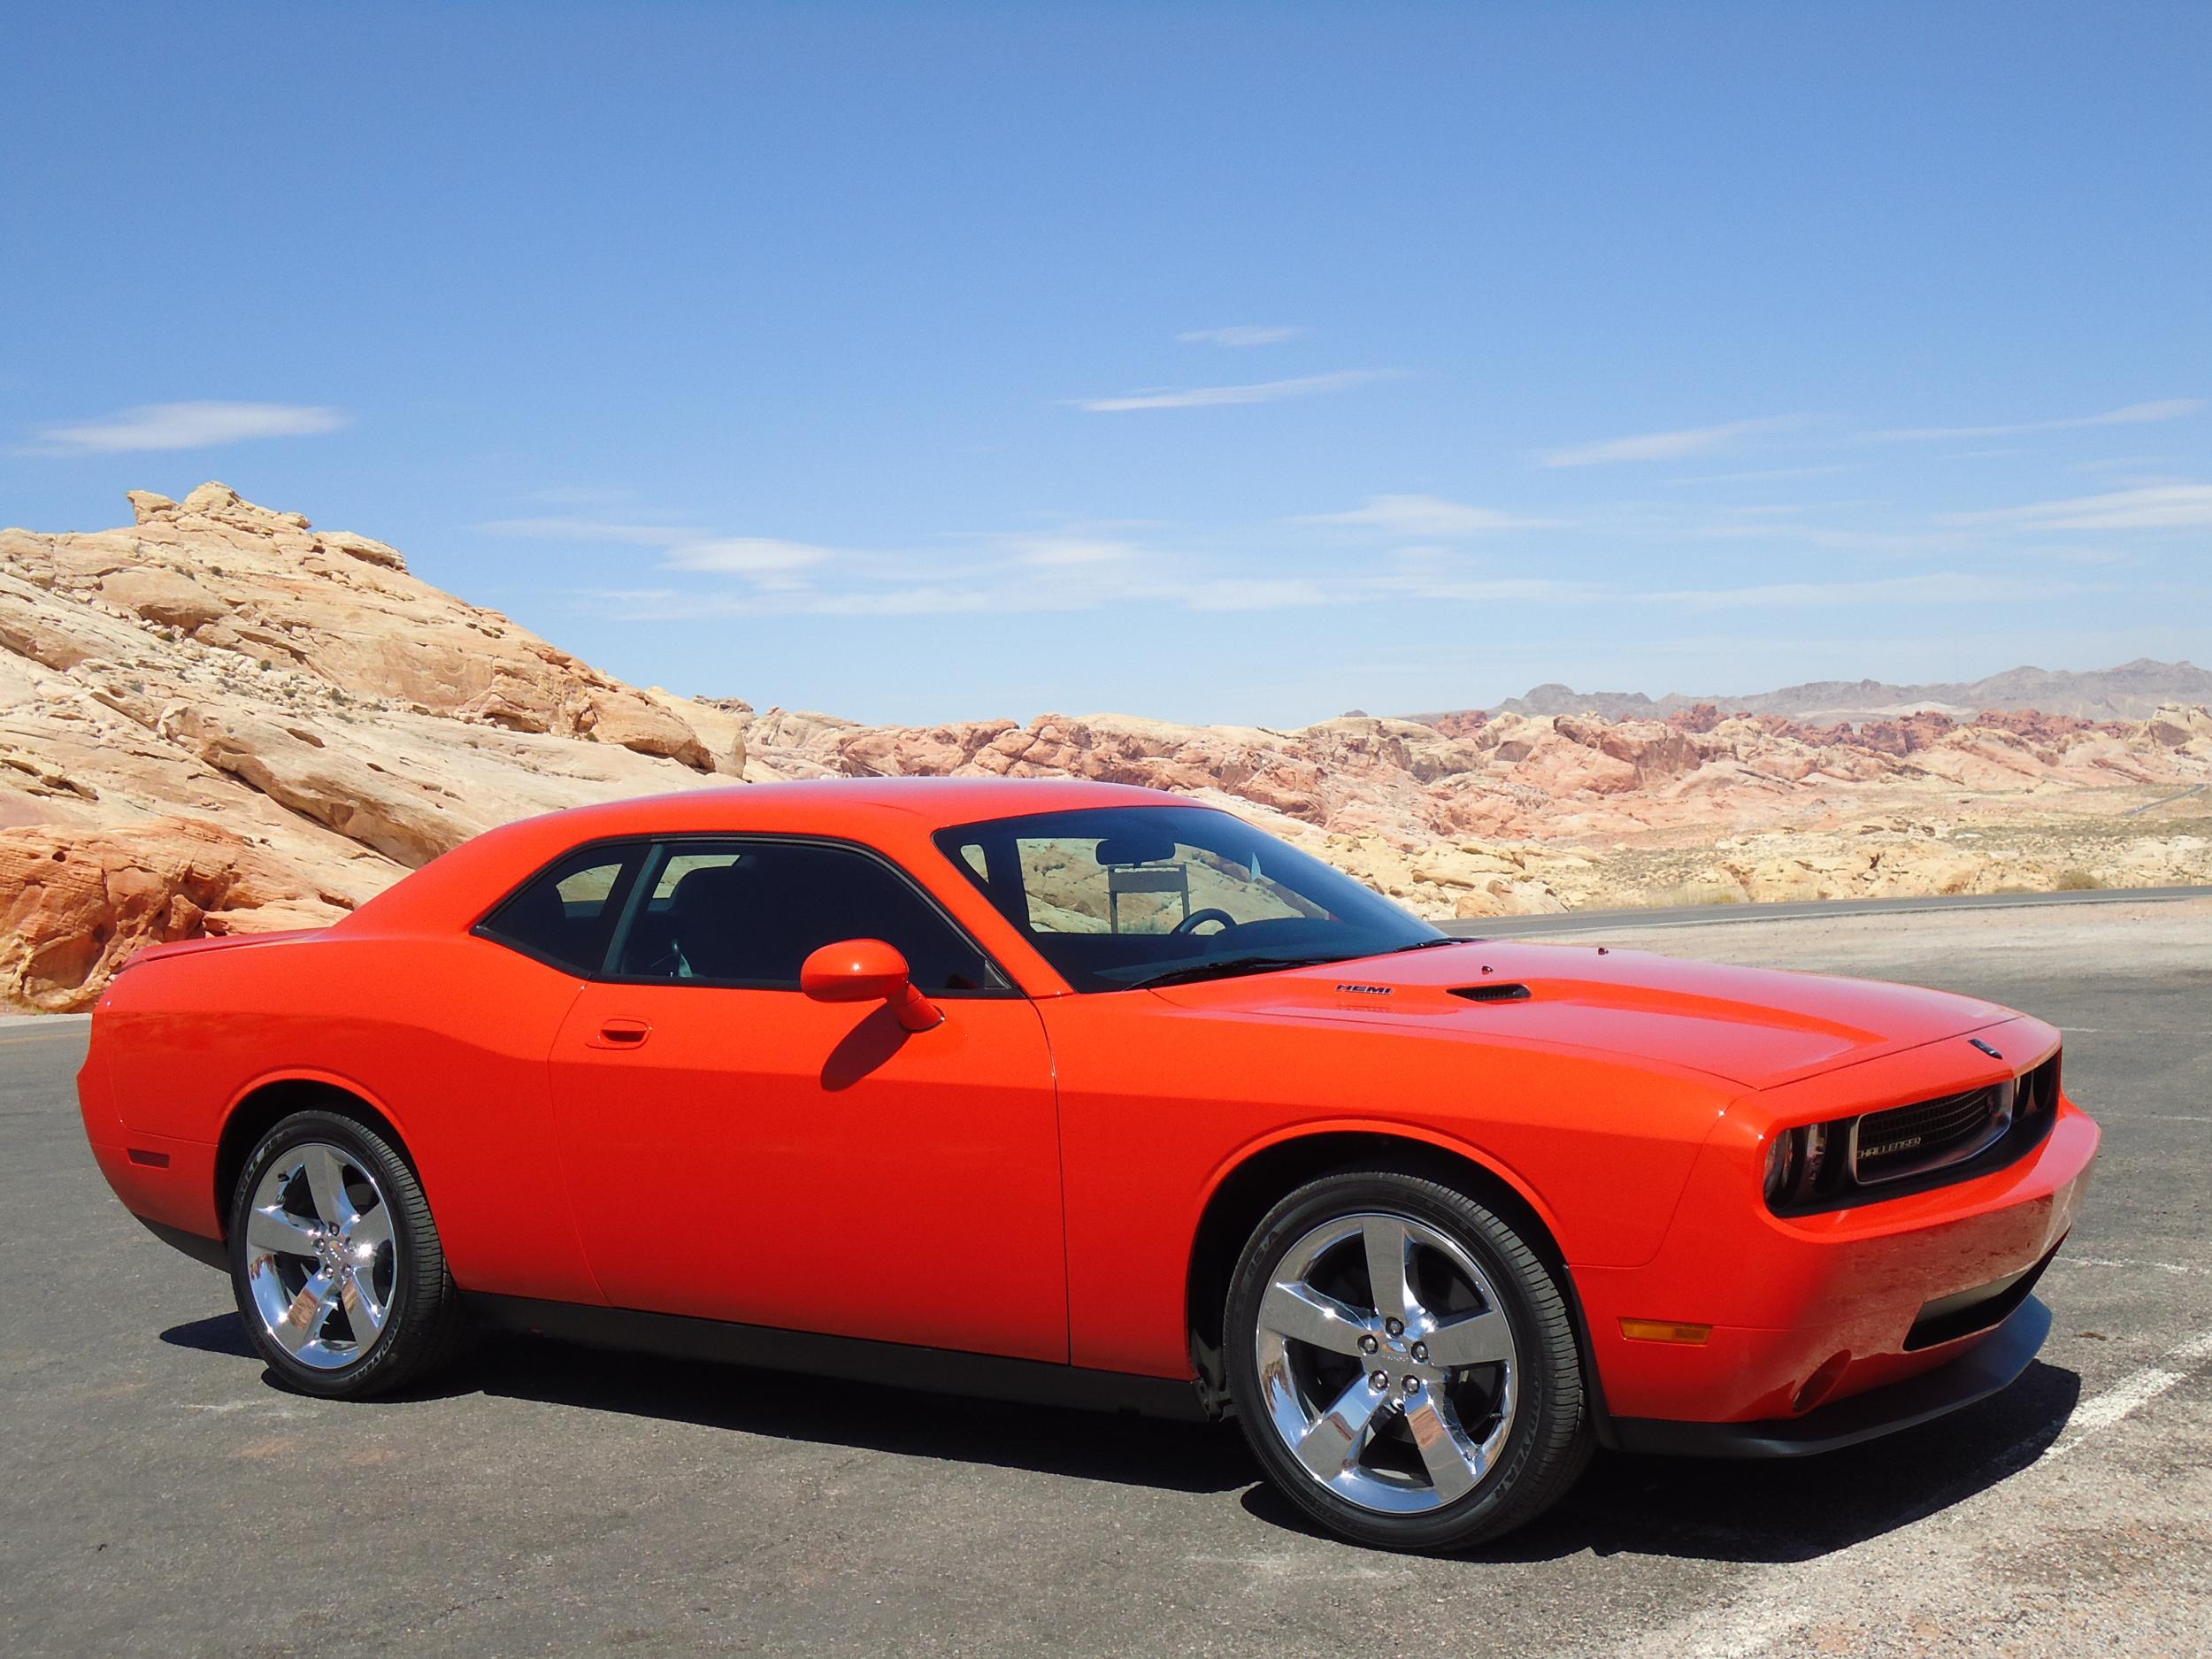 Hemi and Header Orange Challengers-hemi-orange-challenger-valley-fire-033.jpg